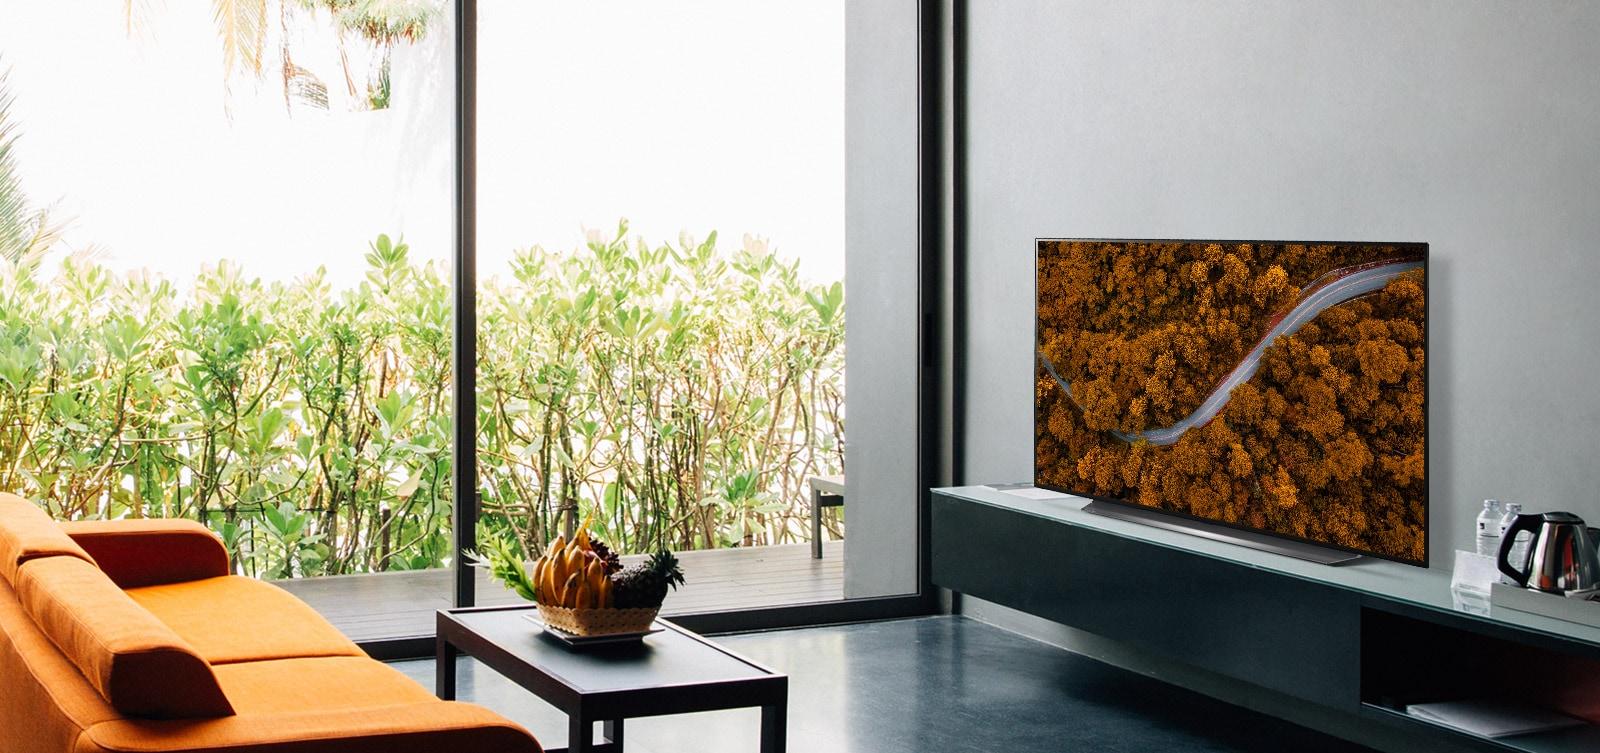 TV-OLED-CX-23-Design-Desktop.jpg (1600×753)